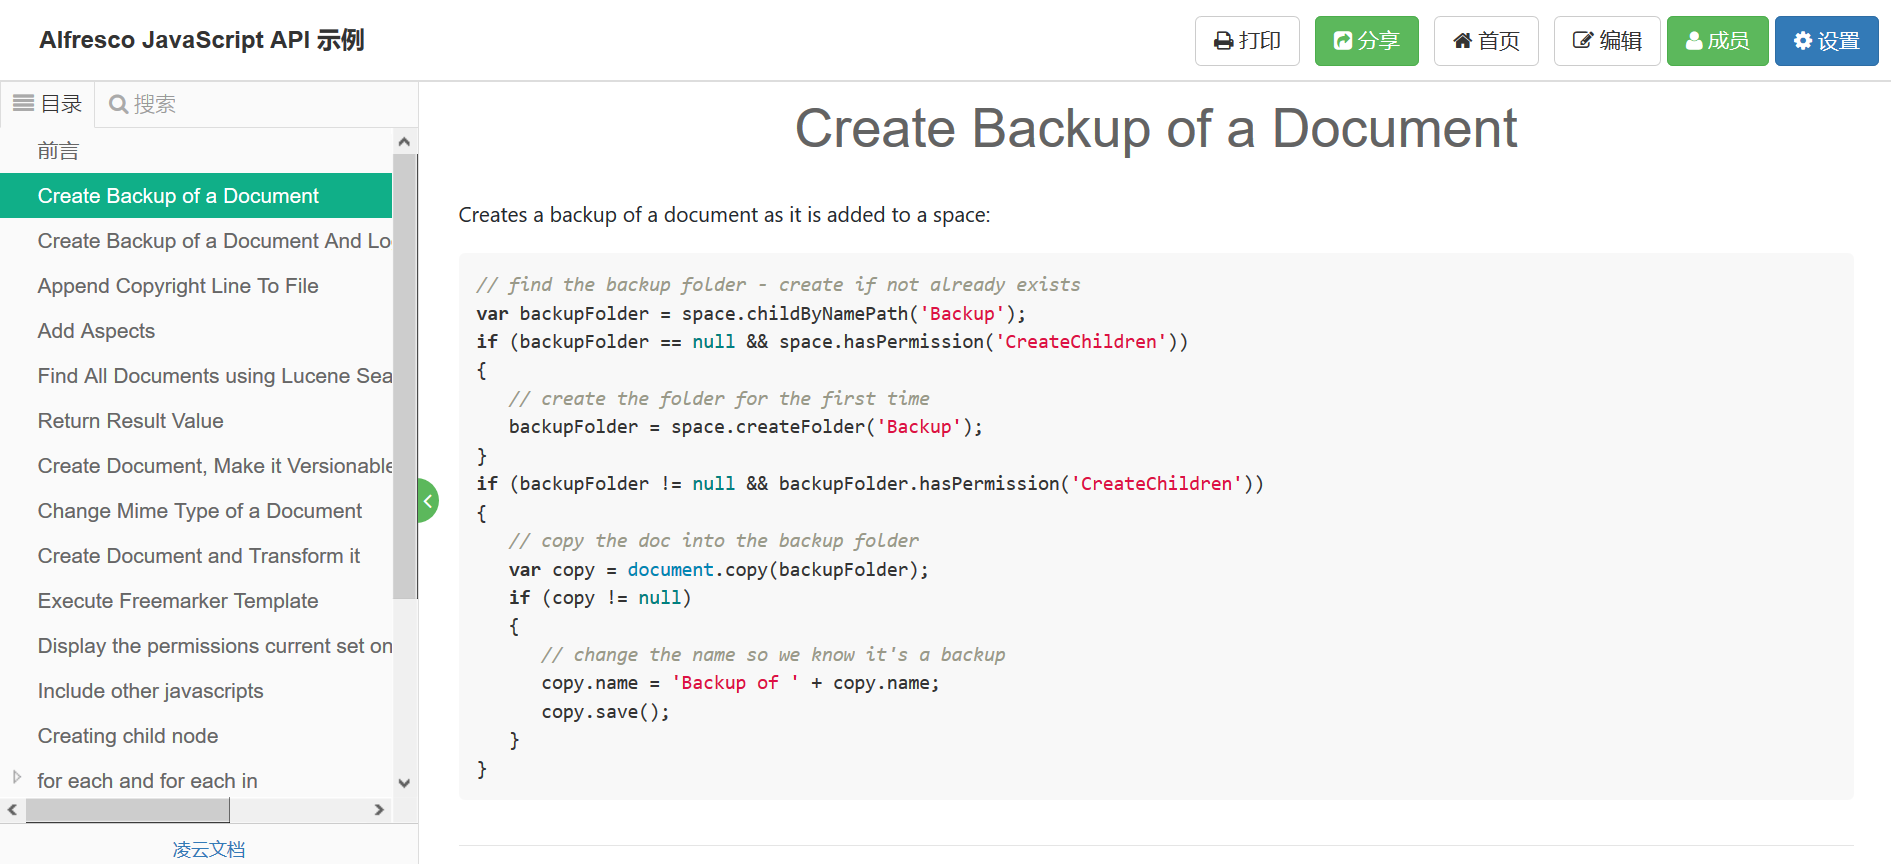 Alfresco JavaScript API 示例